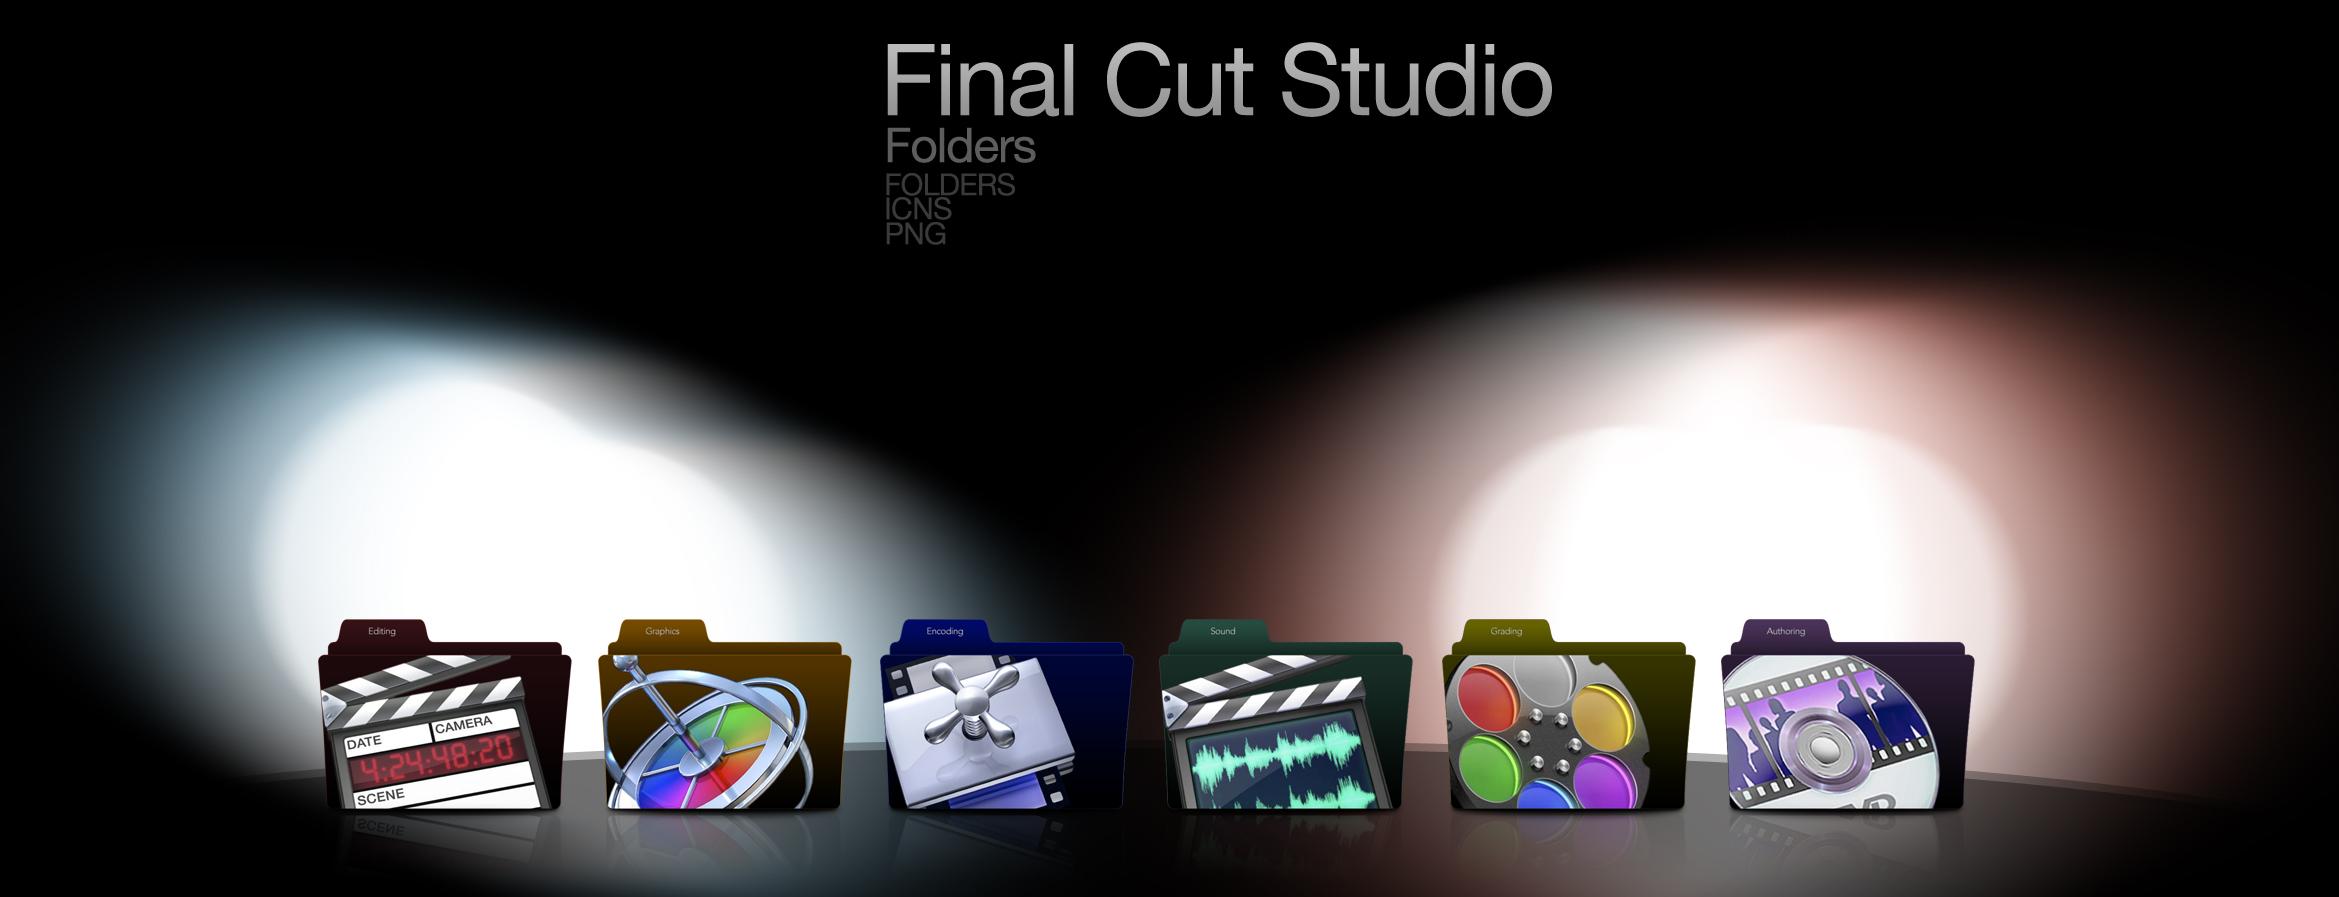 Final Cut Studio Folders Set